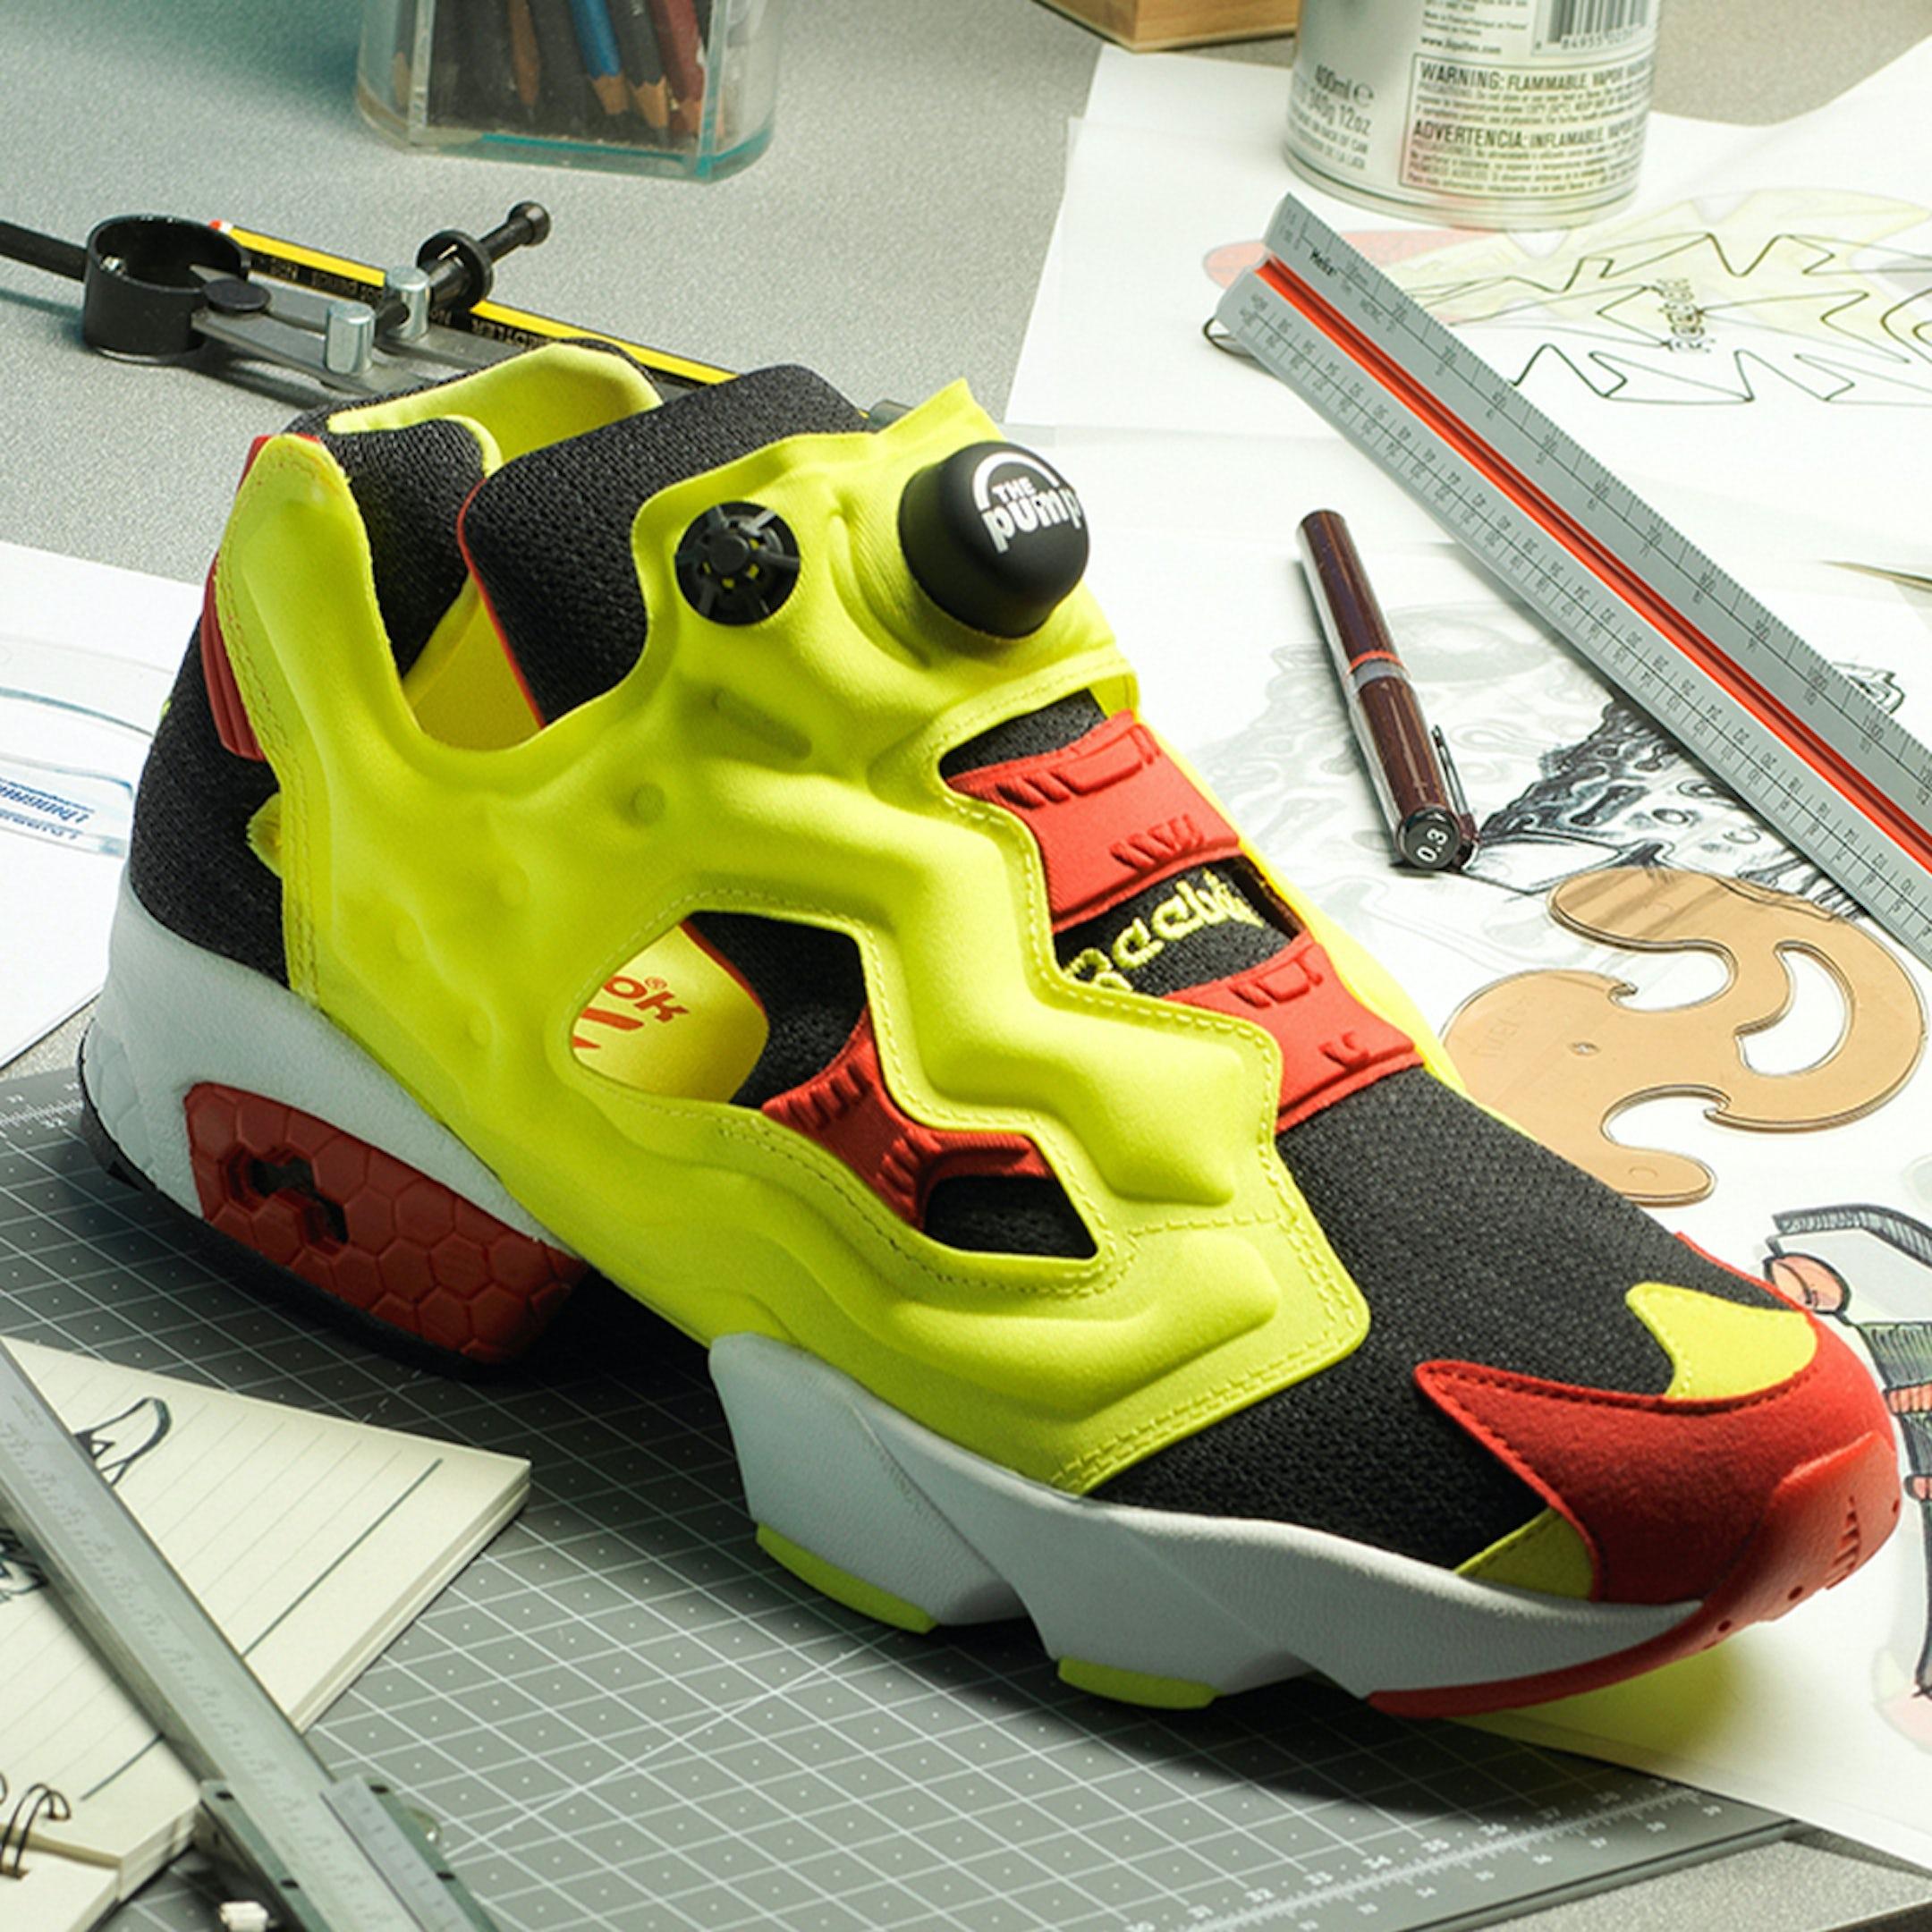 Reebok Classics Top 3 Retro Sneakers